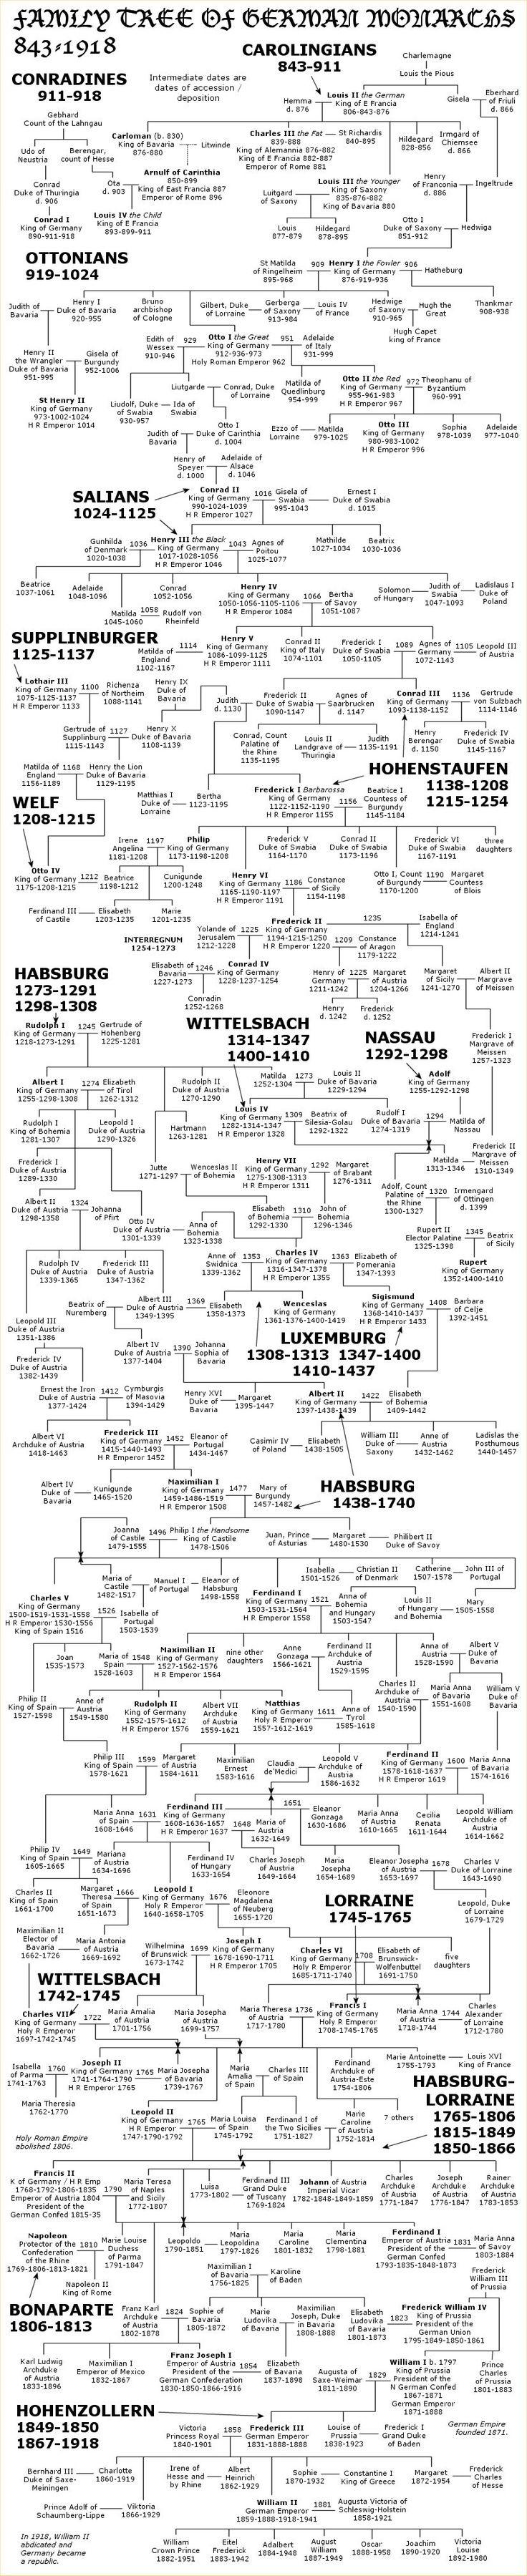 German Monarch Family Tree:  843-1918